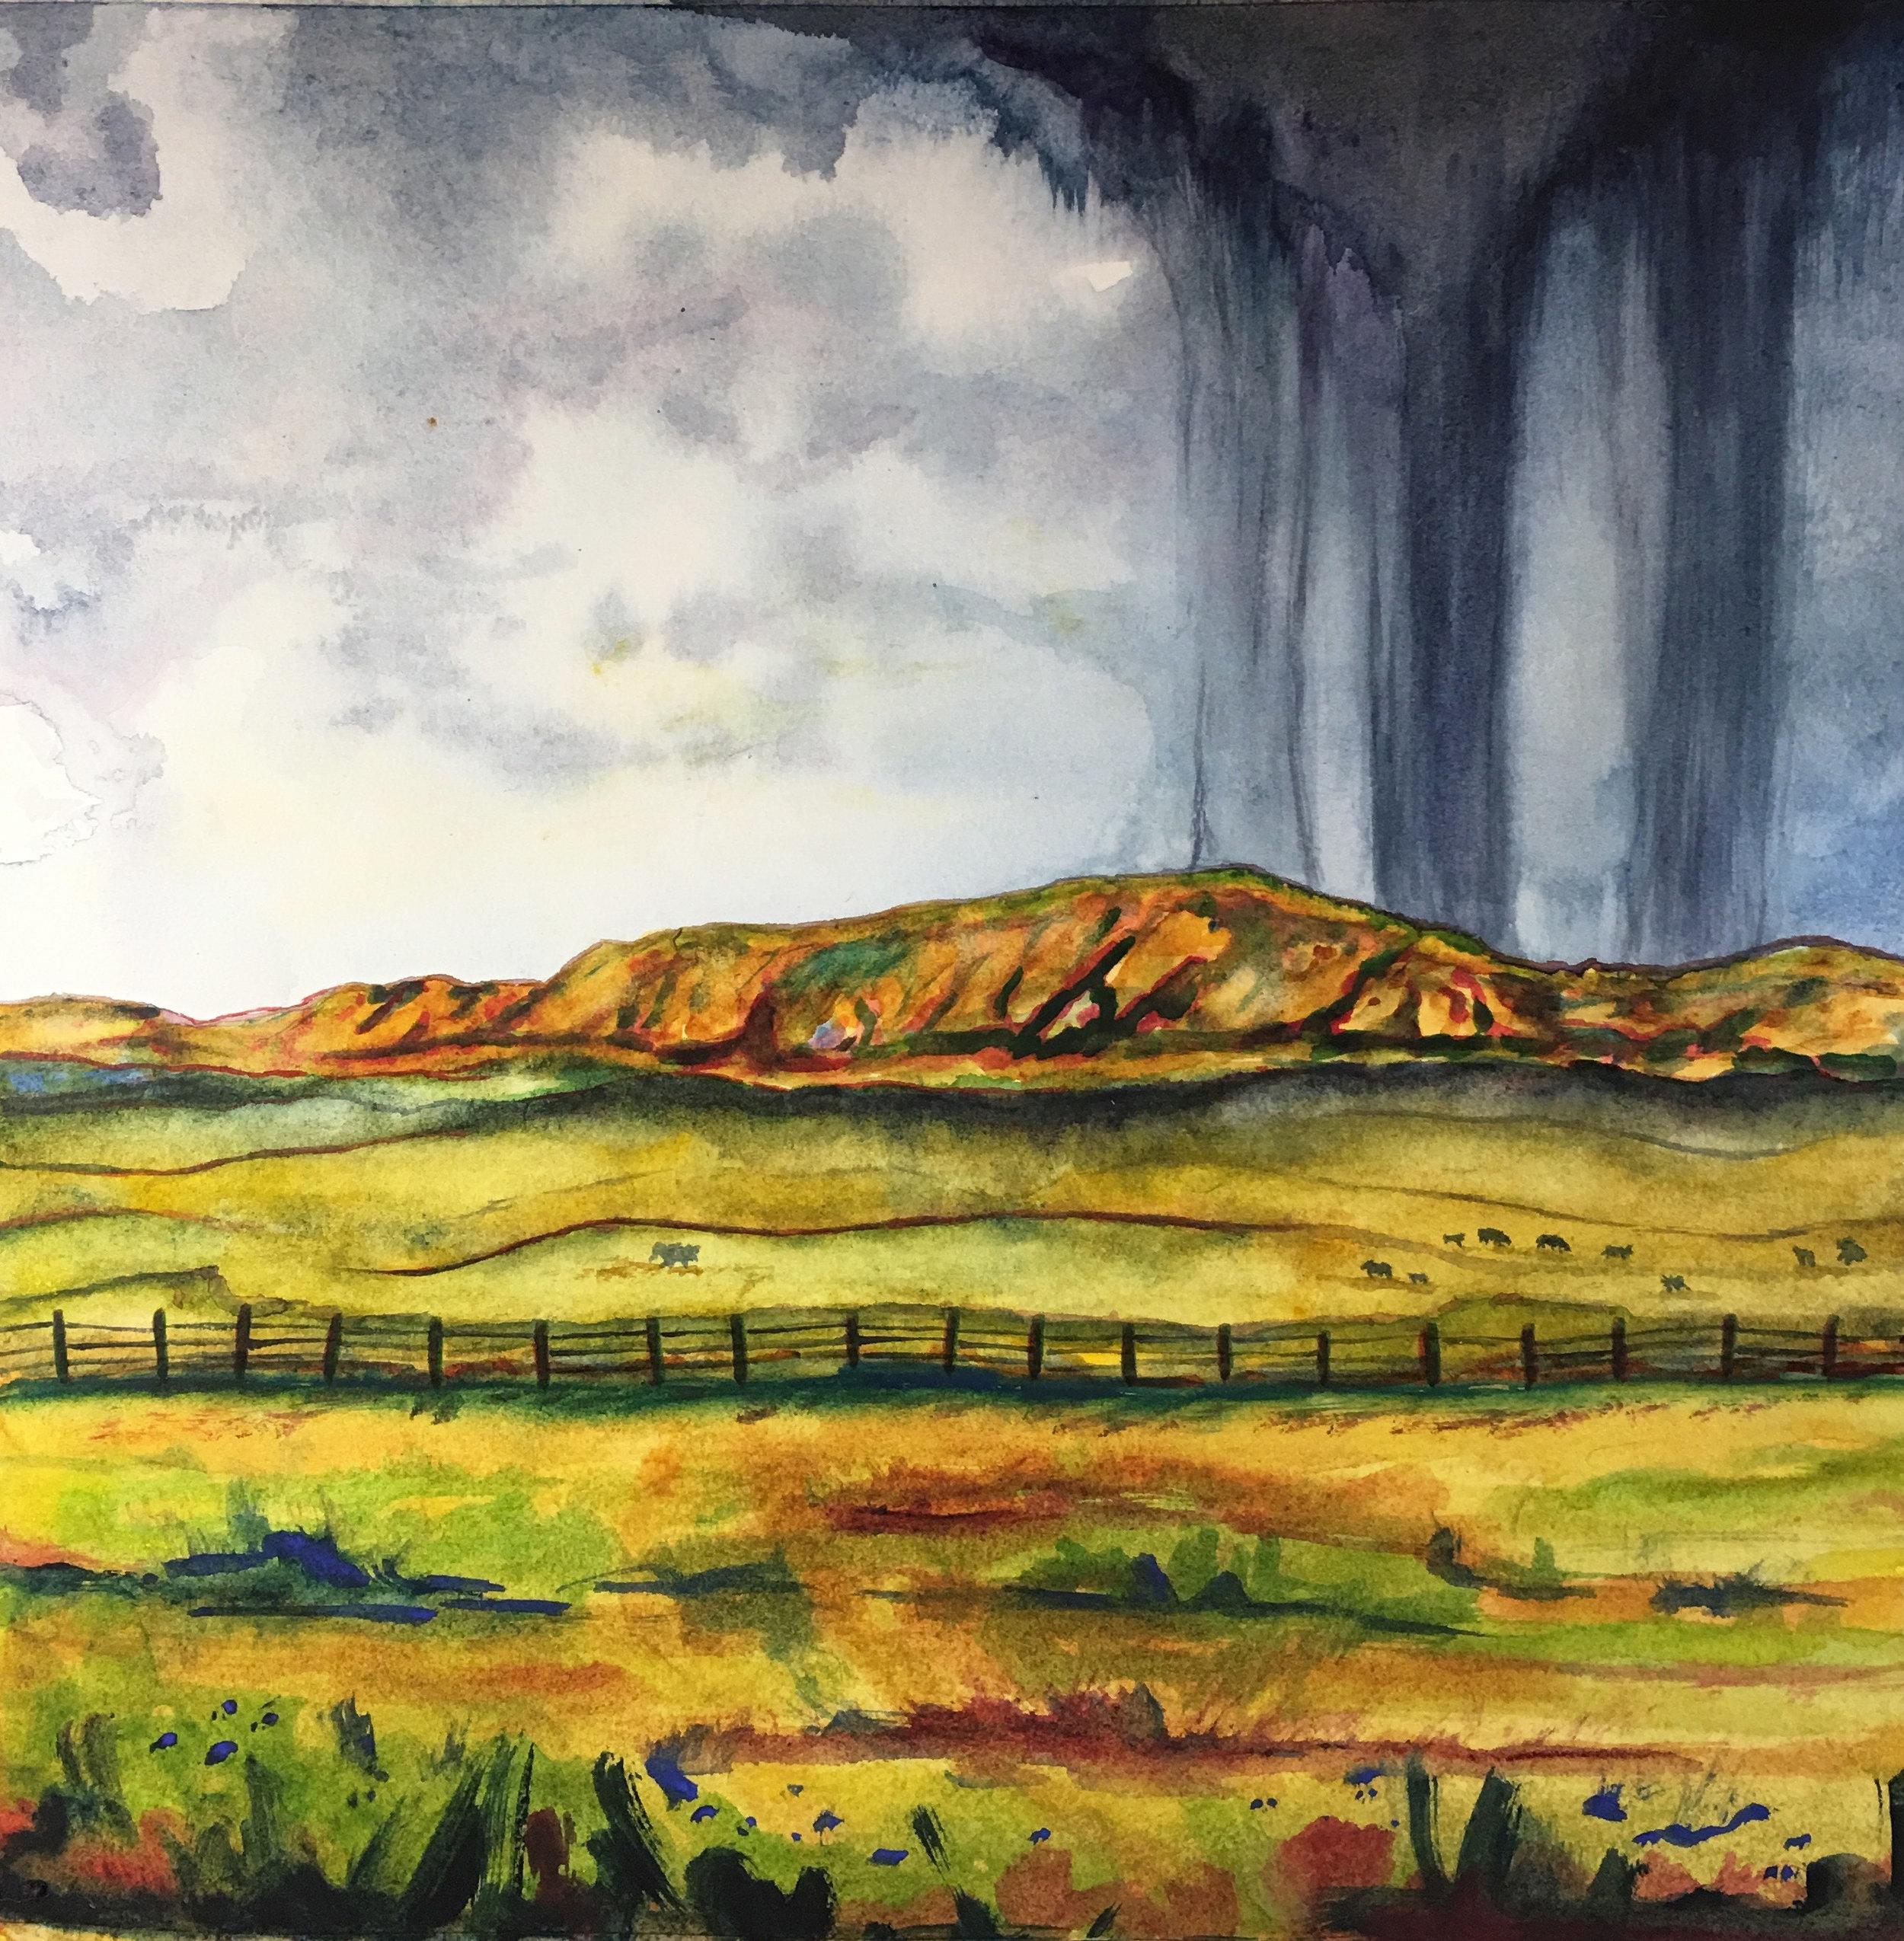 """Wyoming Storm"", watercolor, 10"" x 10"", 2018 by Nancy Marlatt"